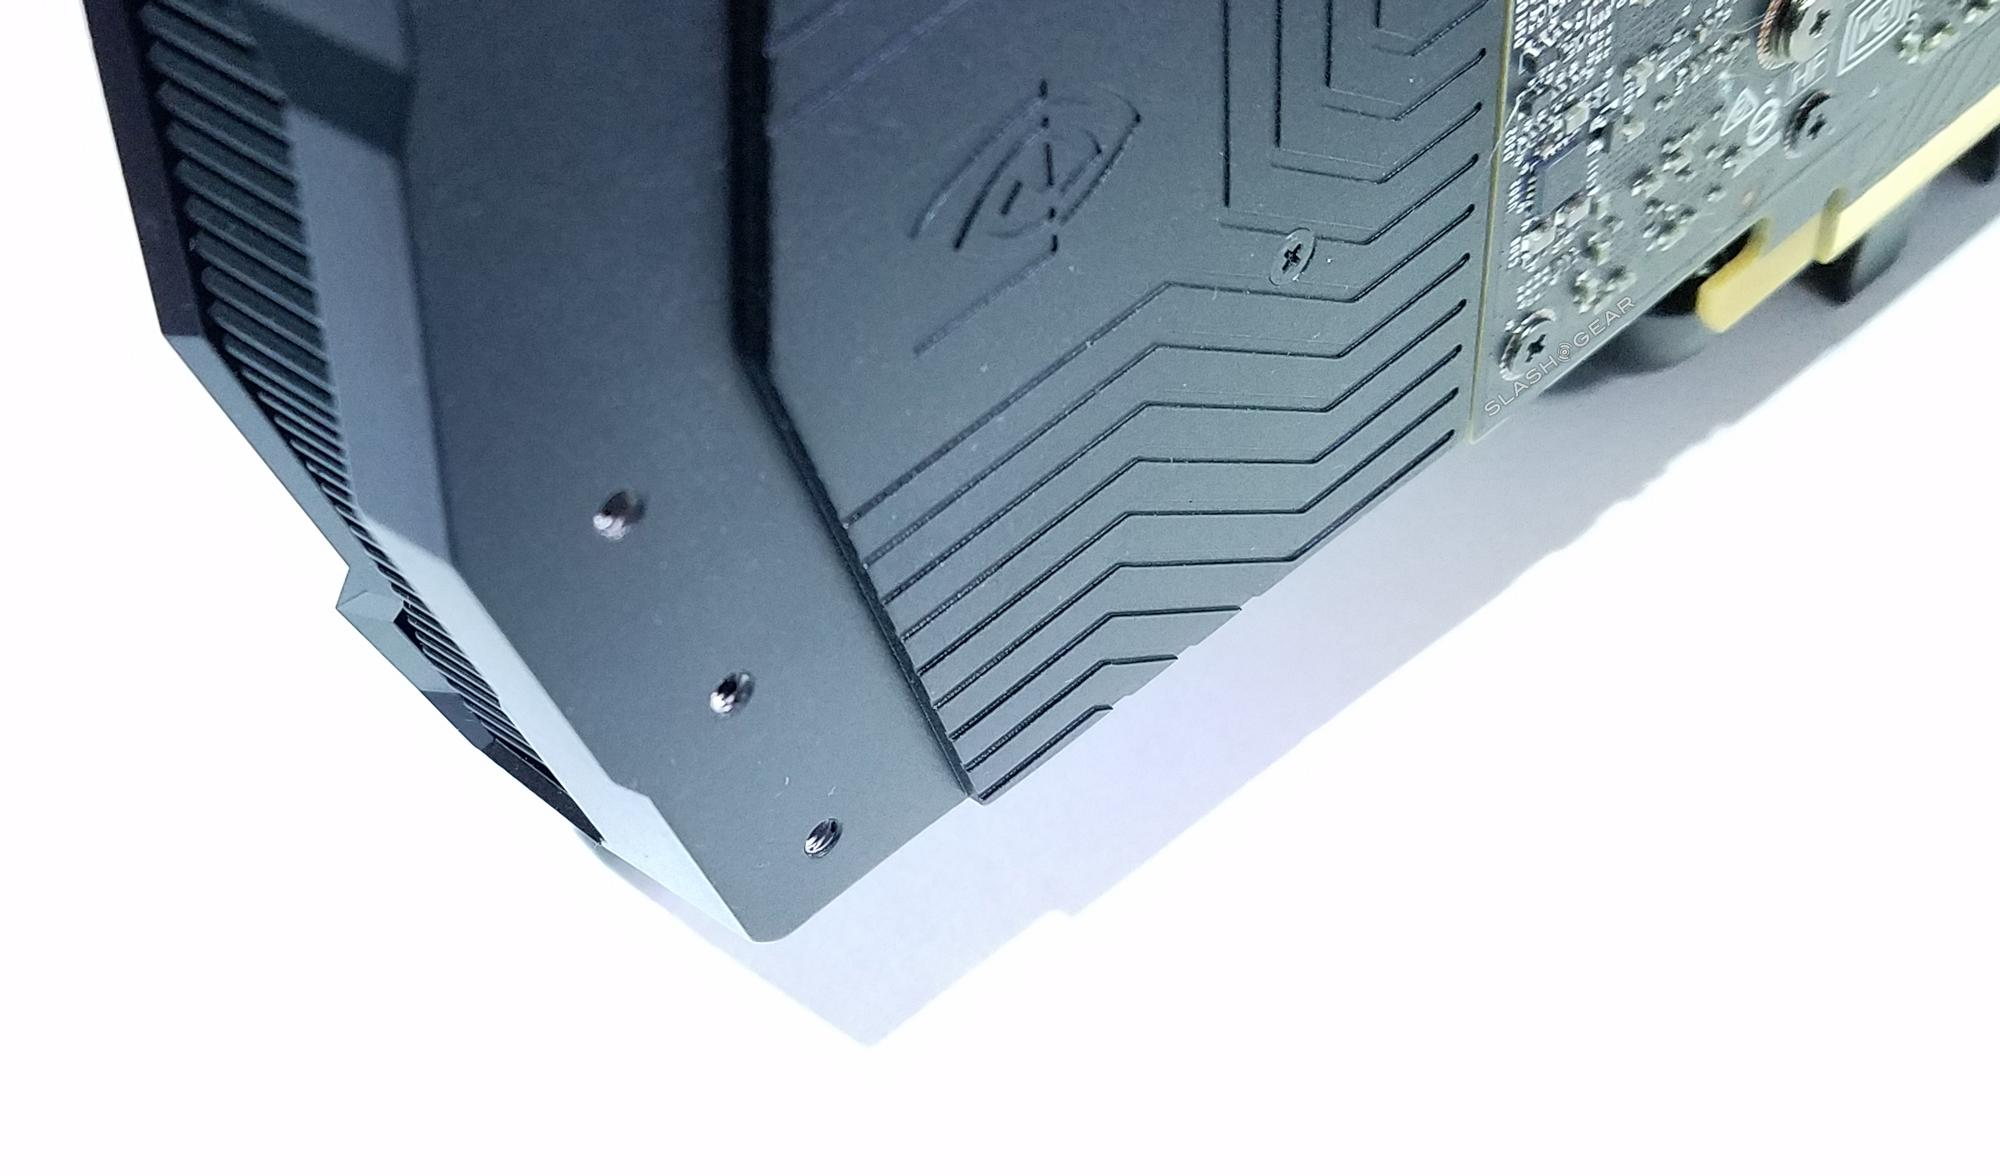 NVIDIA GeForce GTX 1060 preview - SlashGear